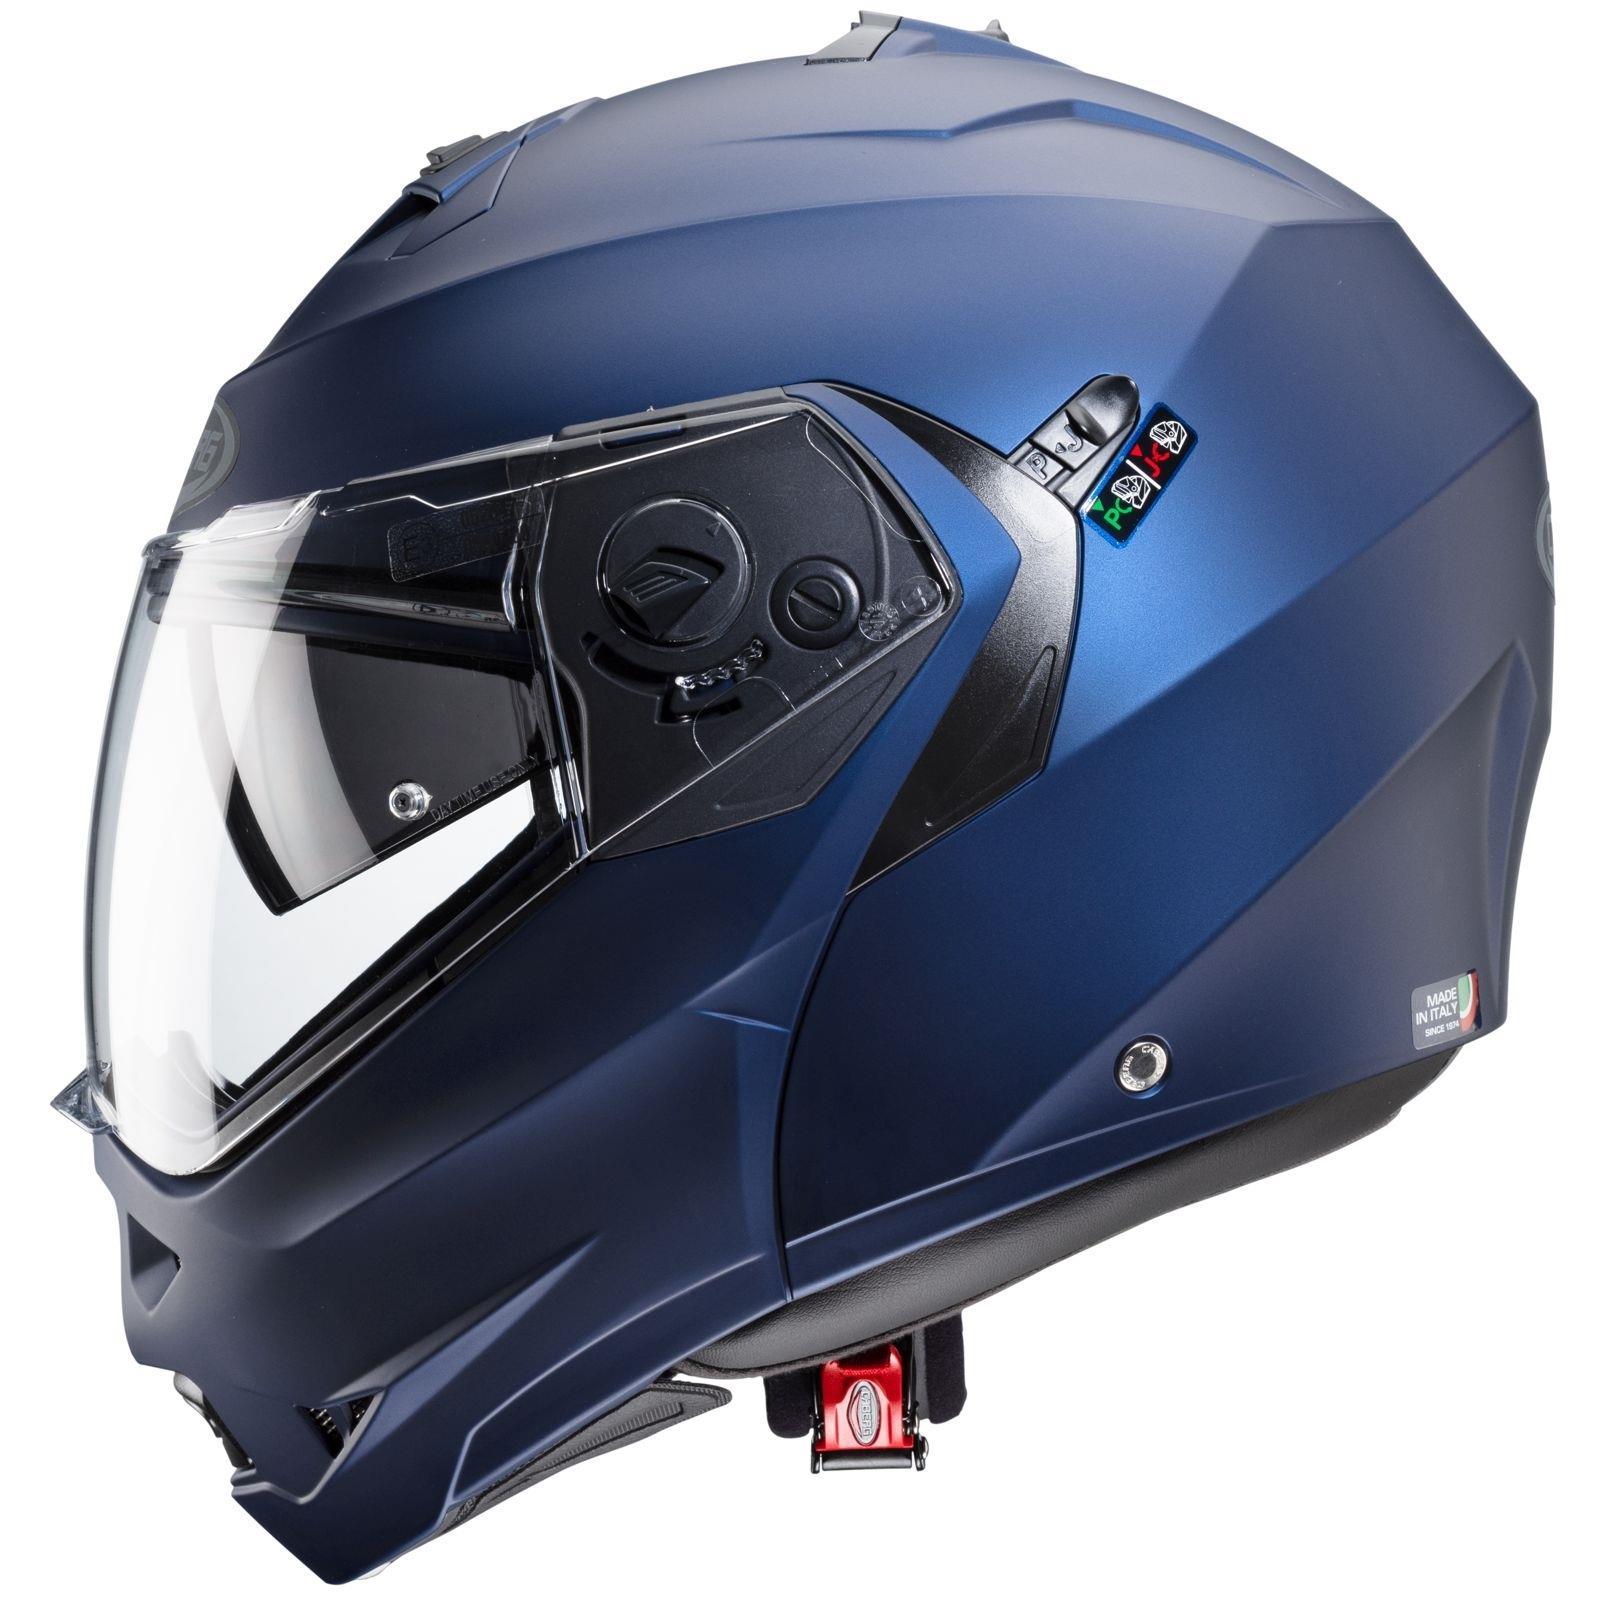 Caberg-Klapp-Helm-Duke-II-2-Motorrad-Belueftet-Sonnenblende-Pinlock-Visier-Jet Indexbild 10